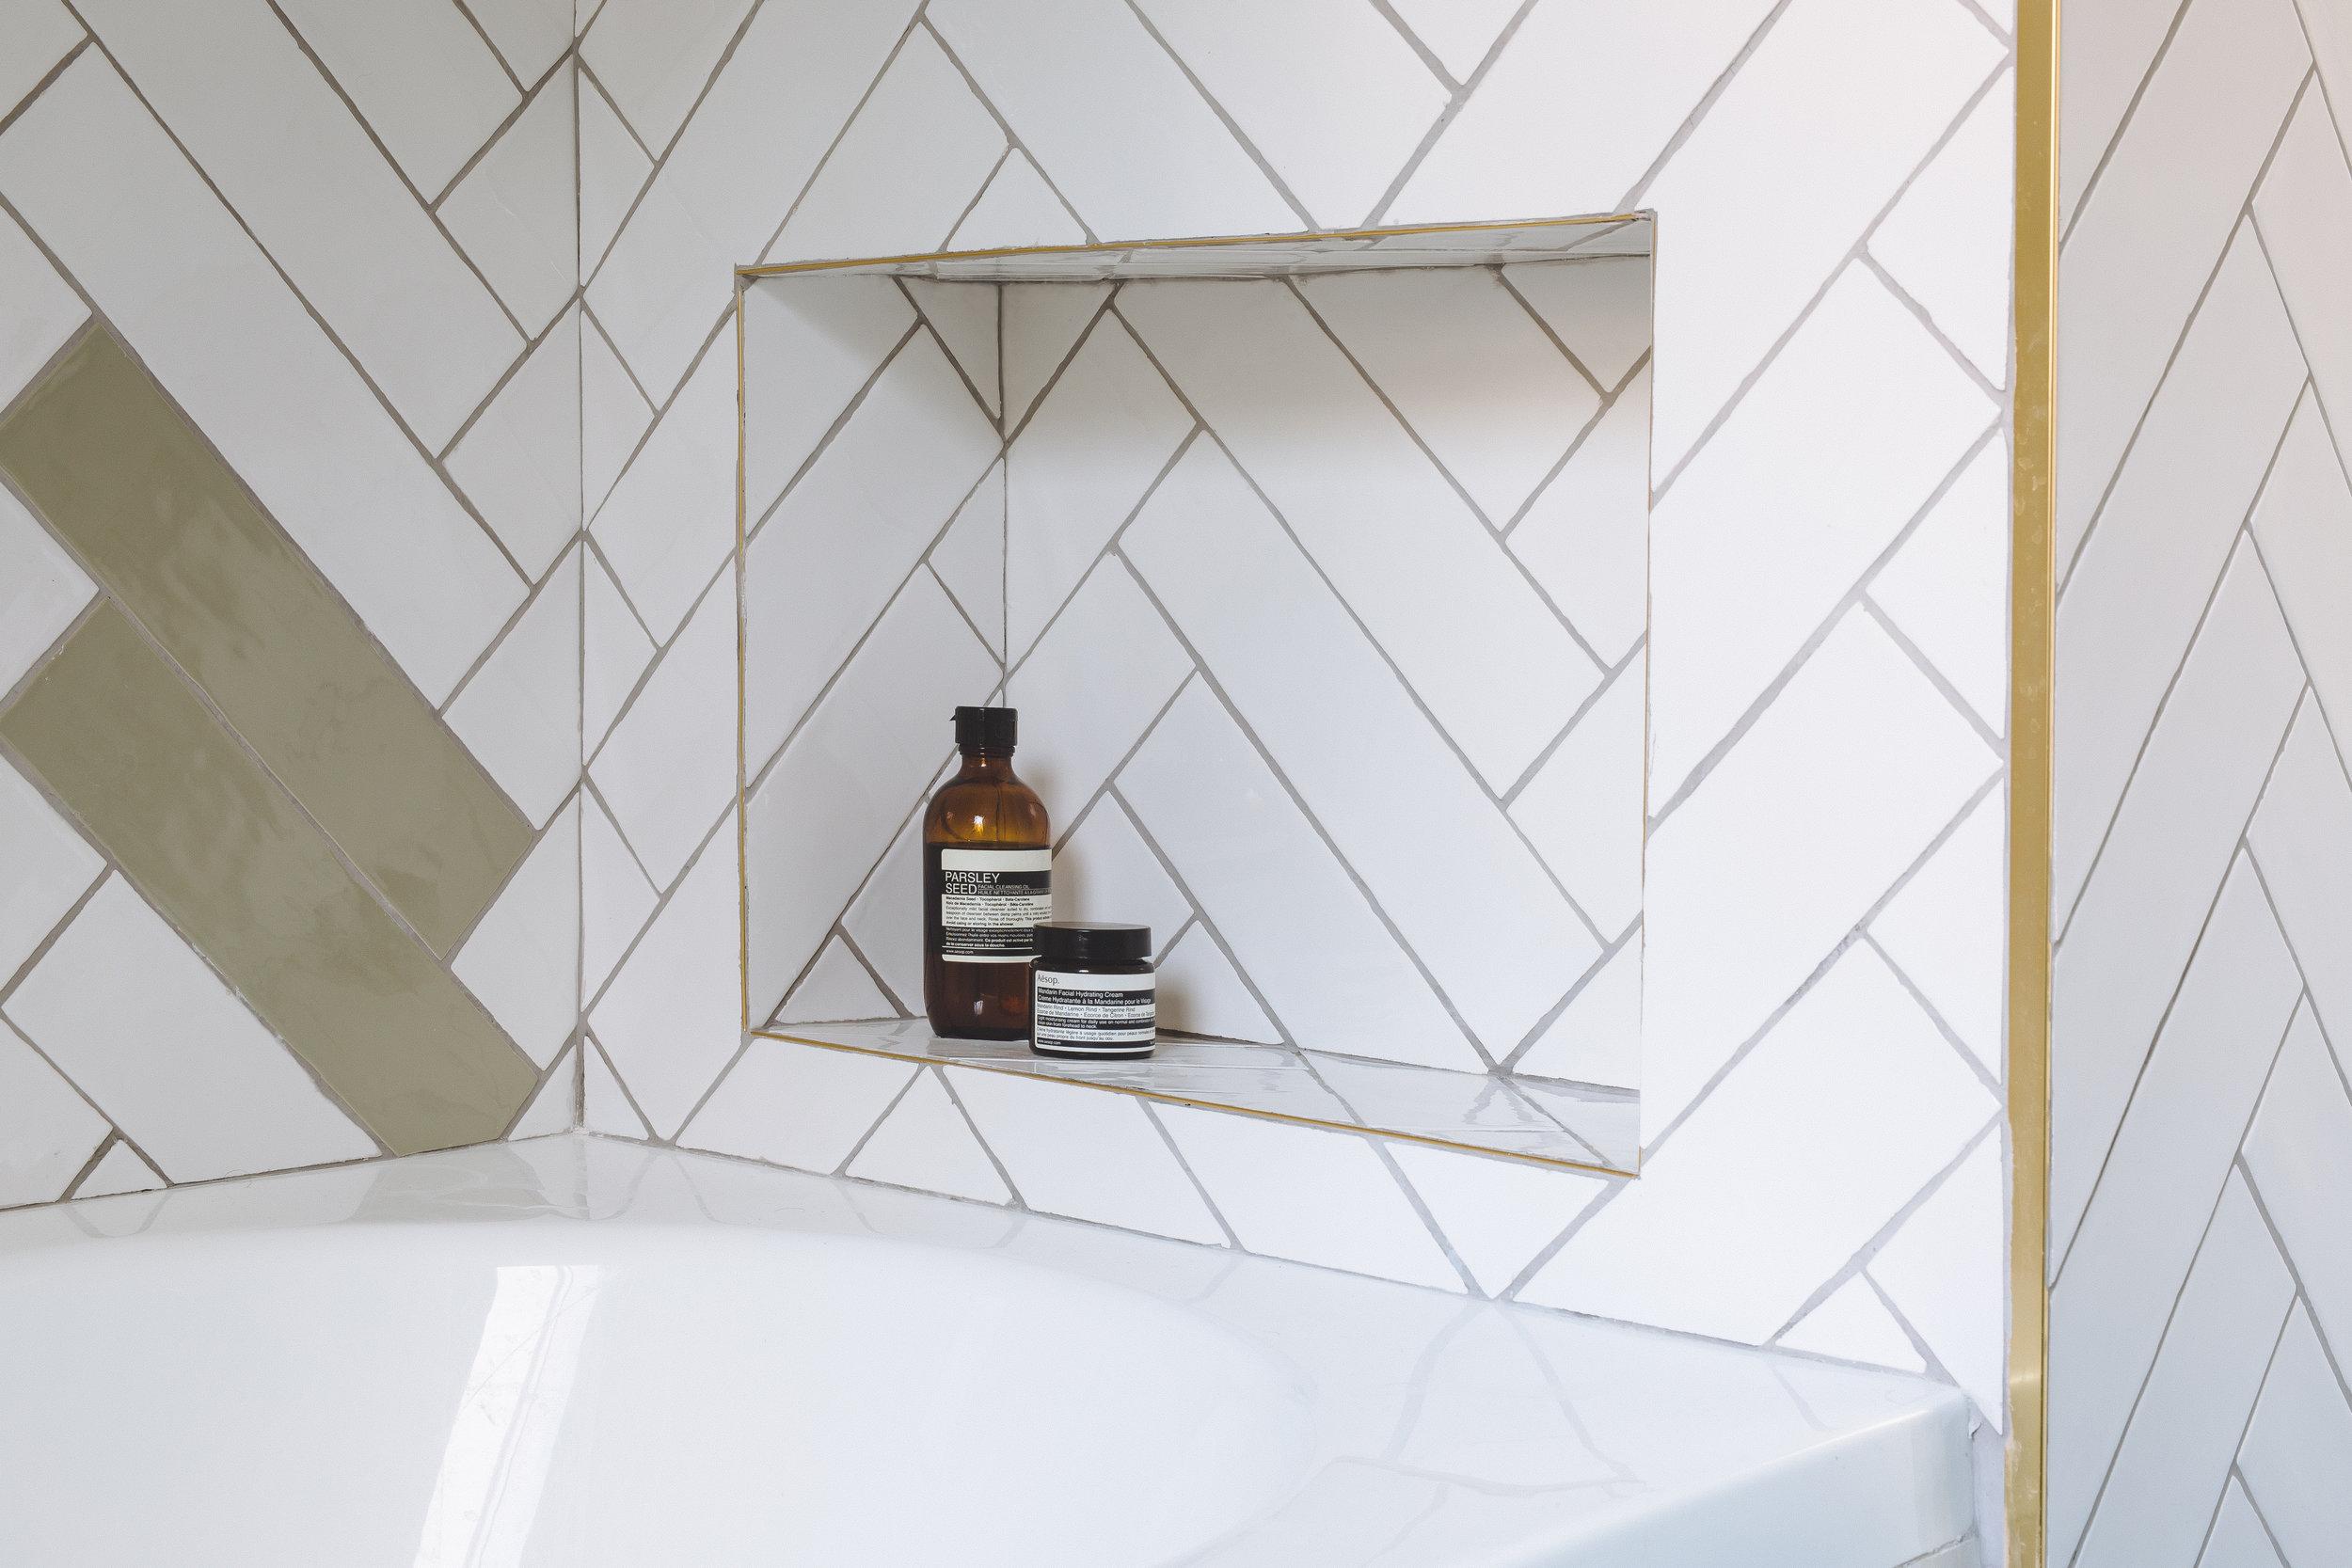 Bathroom subway tiles in fishbone. Brass details